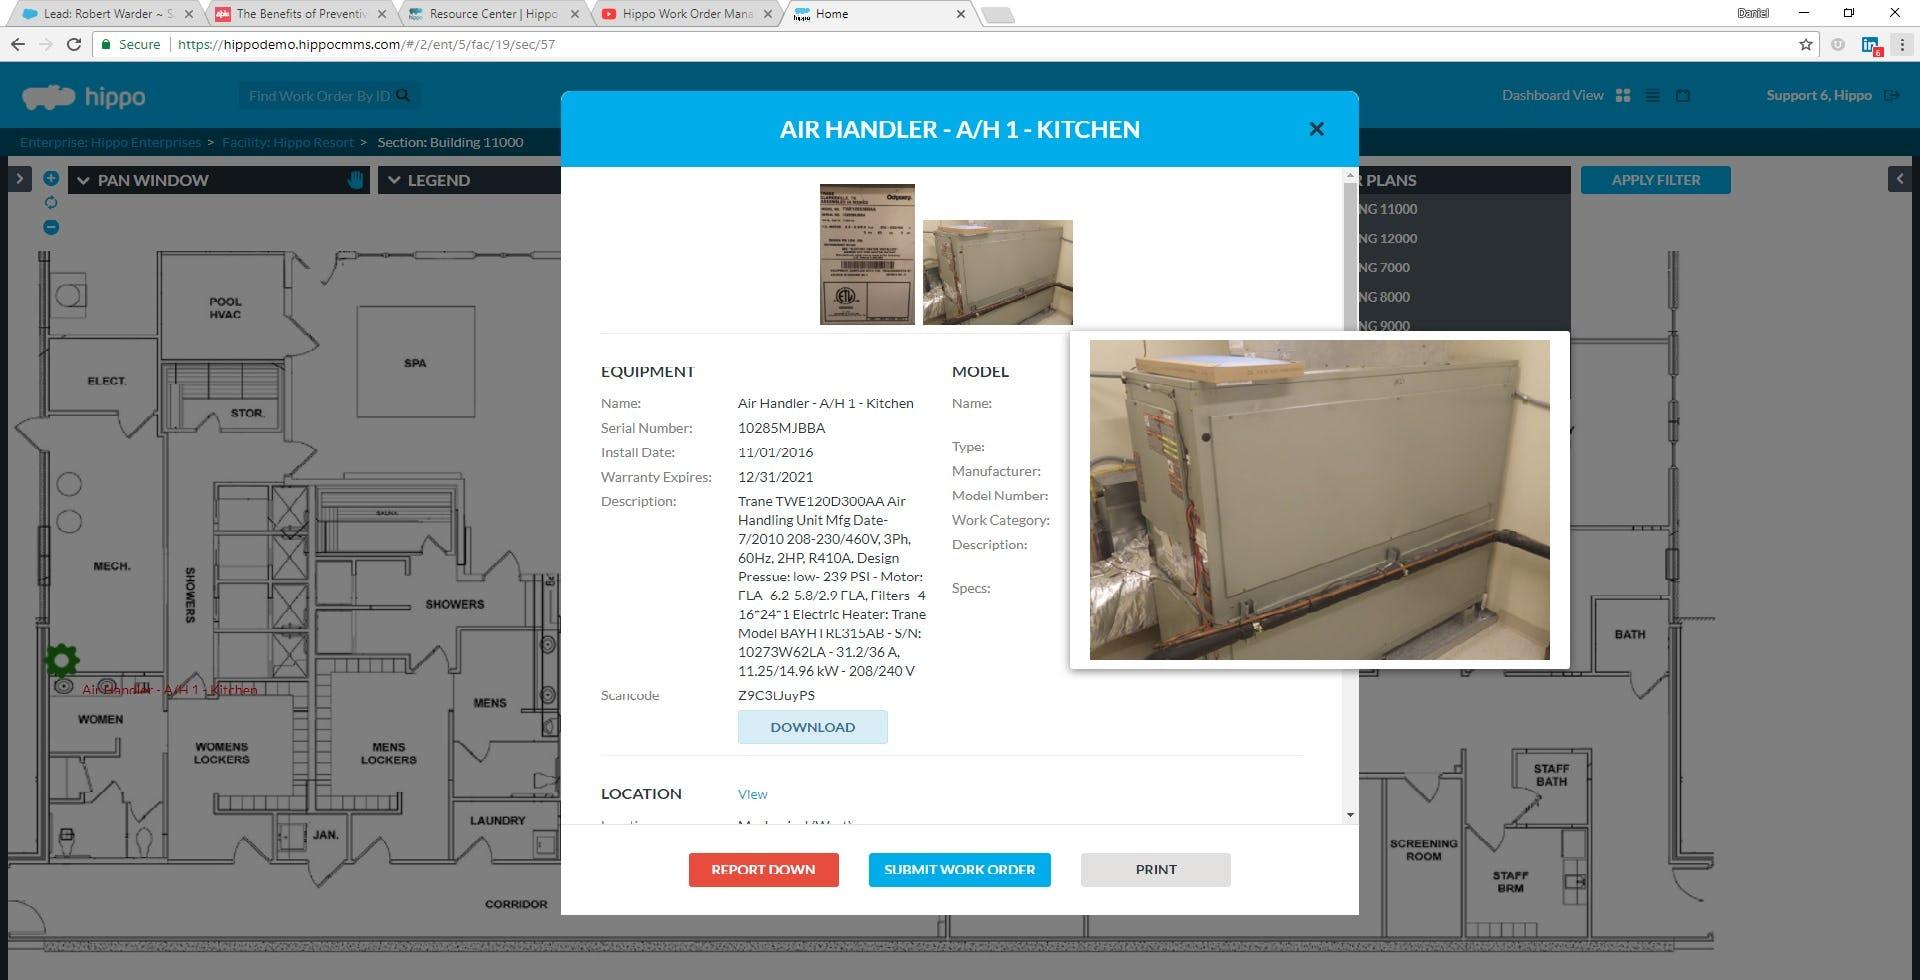 Hippo CMMS Software - Access Equipment Details